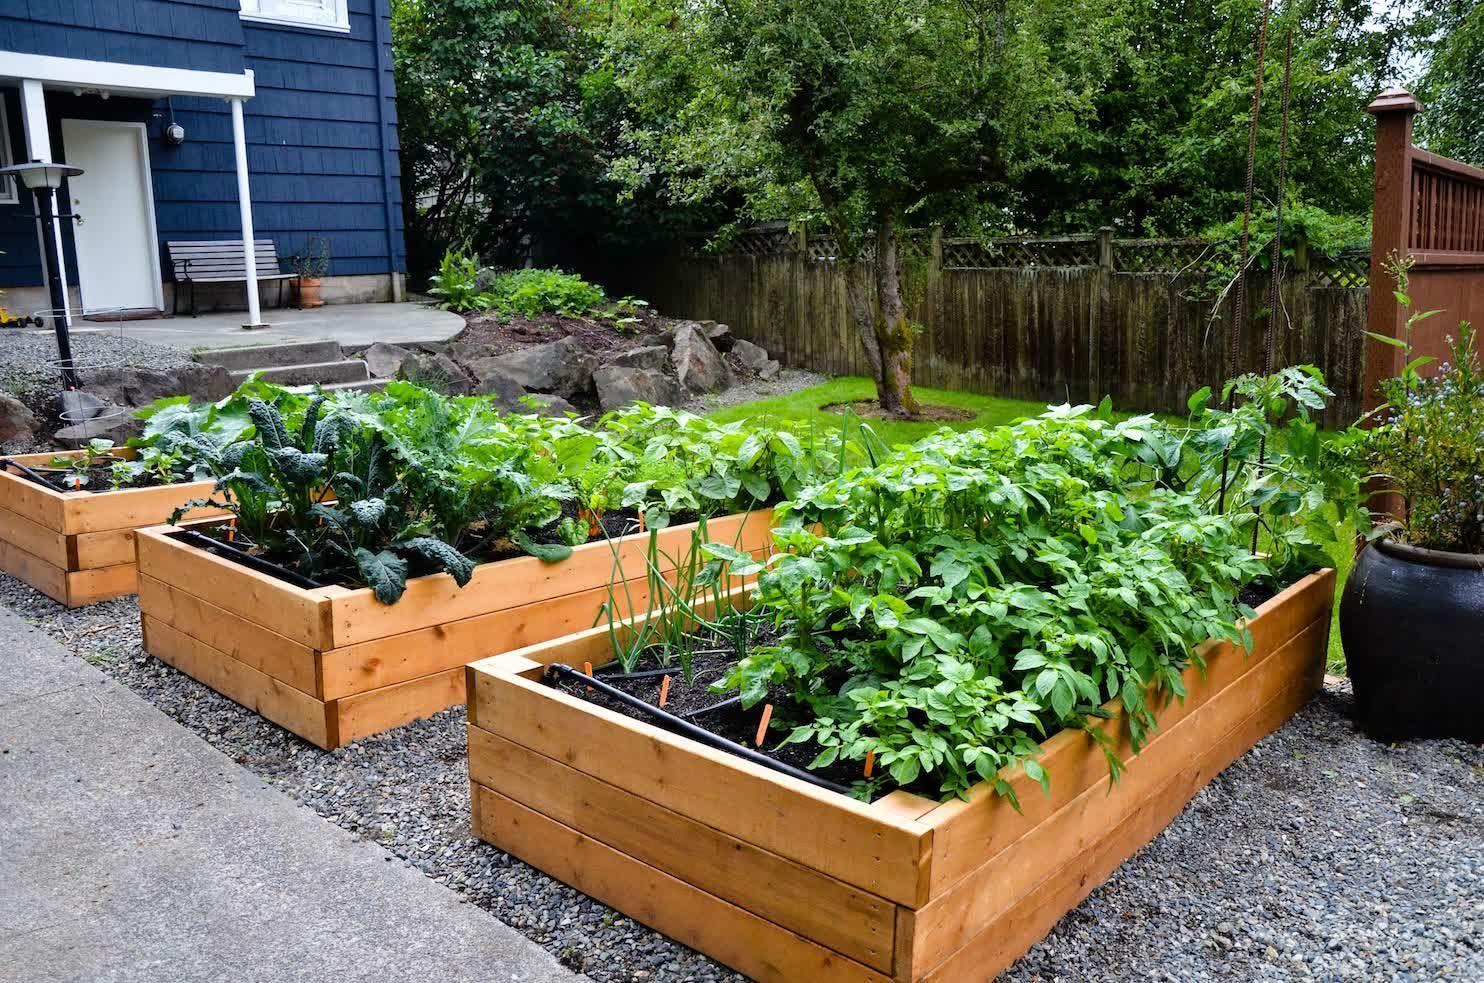 Home vegetable garden design  Smalln Winter Vegetables Design Plans Vegetable To Grow Easy In